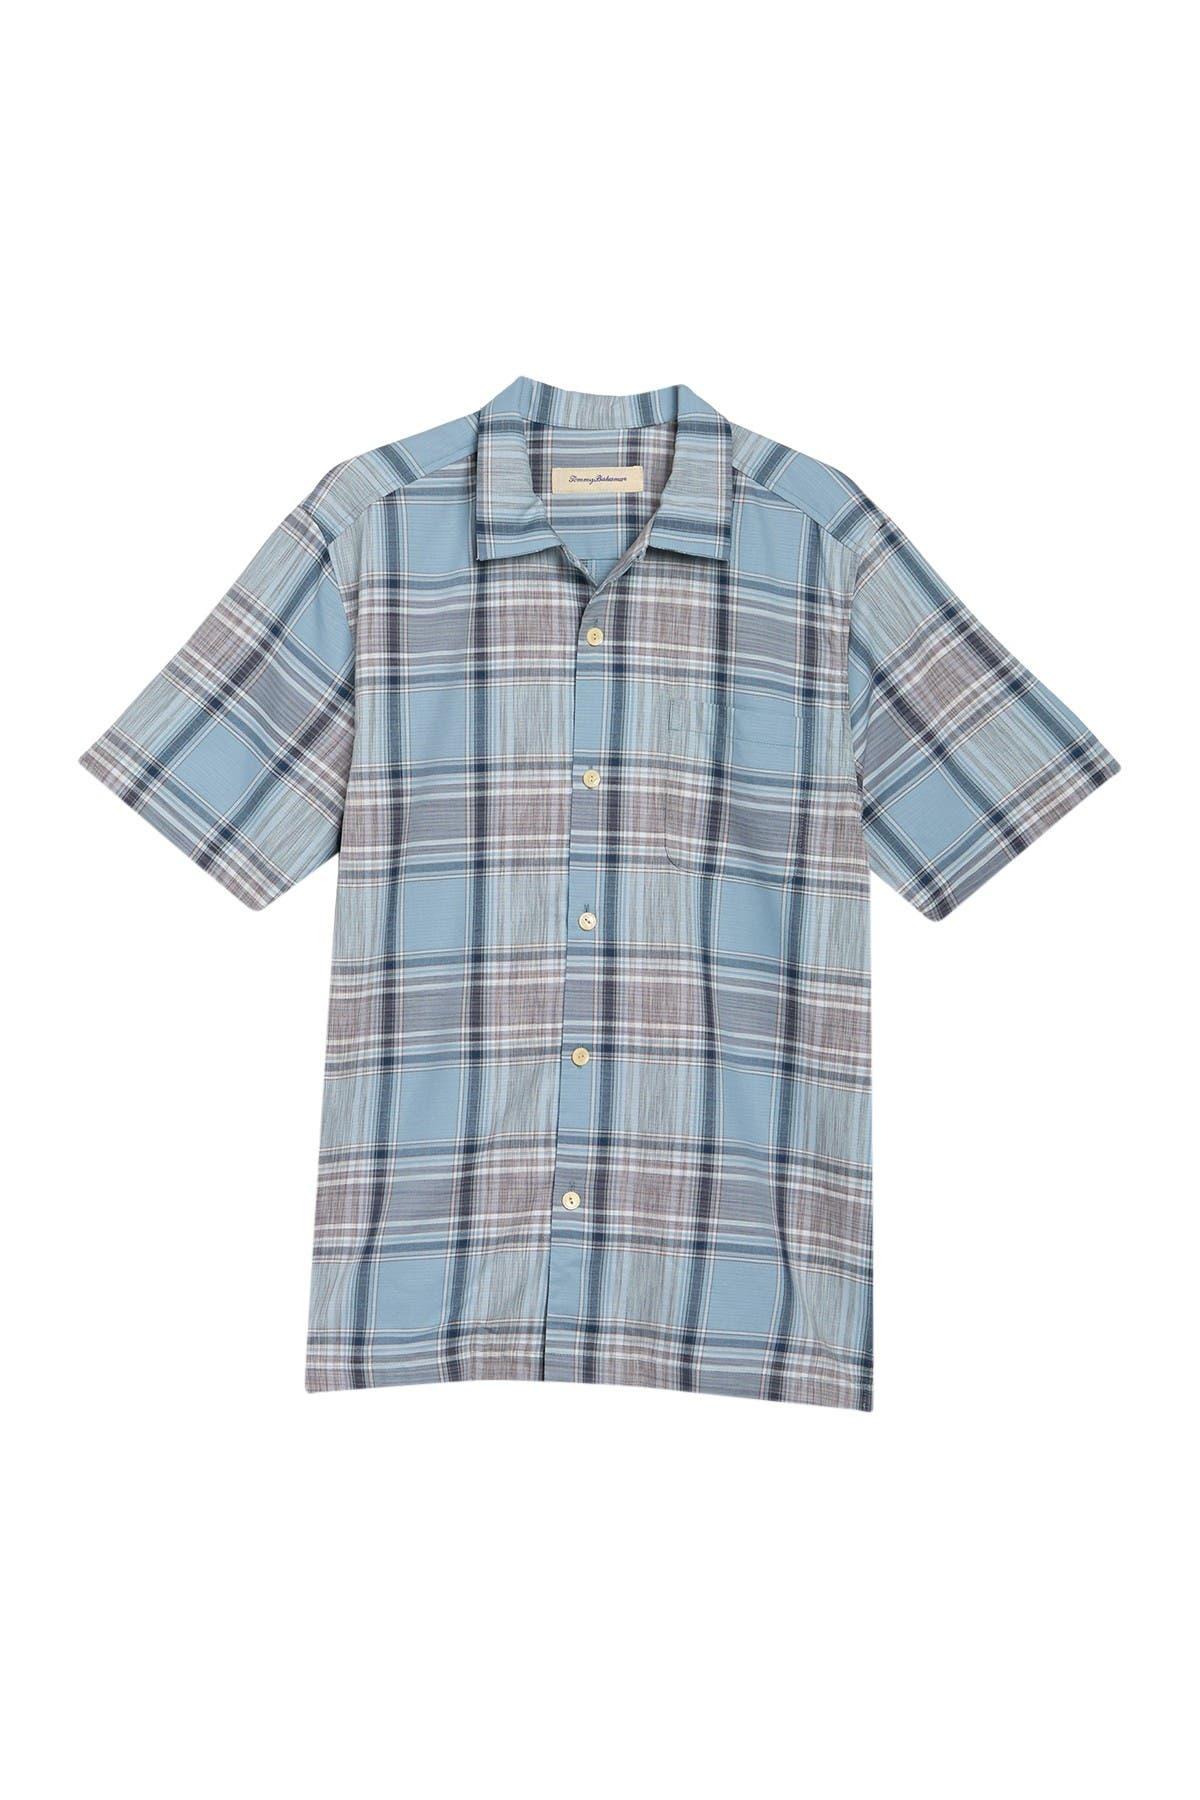 Image of Tommy Bahama Orcona Beach Plaid Regular Fit Short Sleeve Shirt